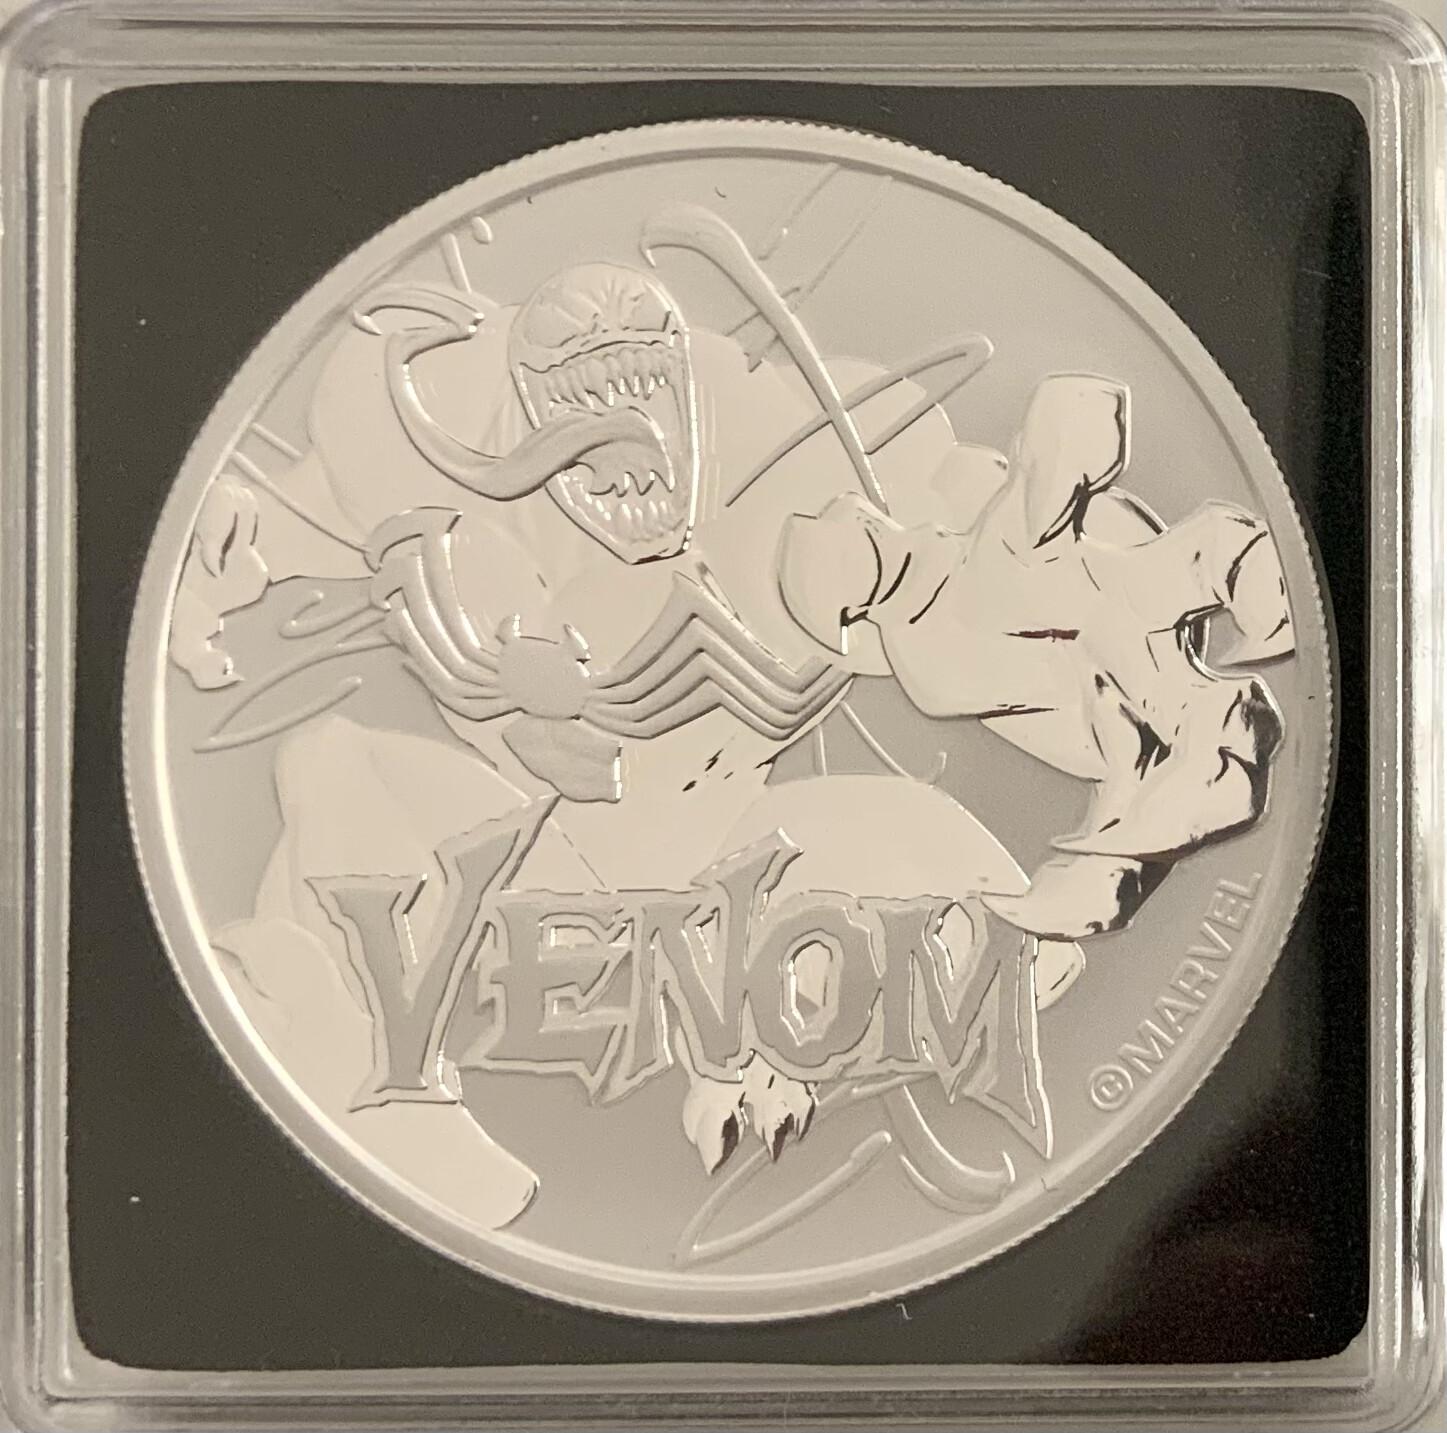 1 Oz Silver - Marvel Venom 2020 - Tuvalu